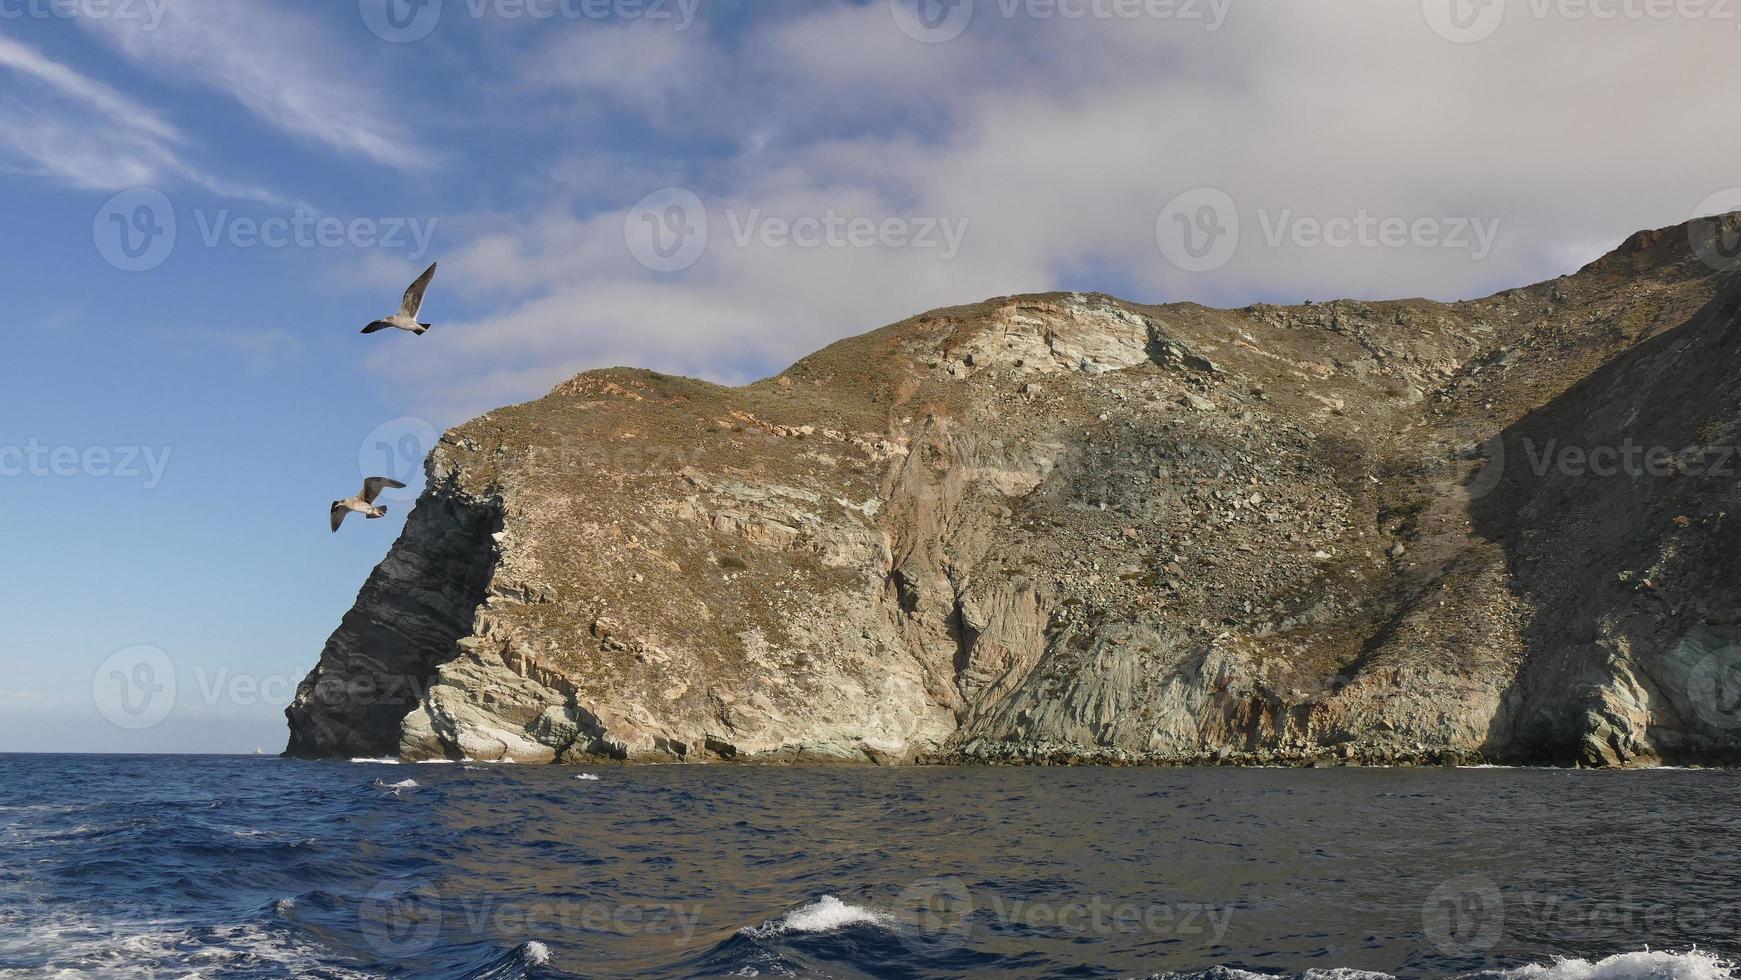 Catus Bay westkant van Catalina Island. foto